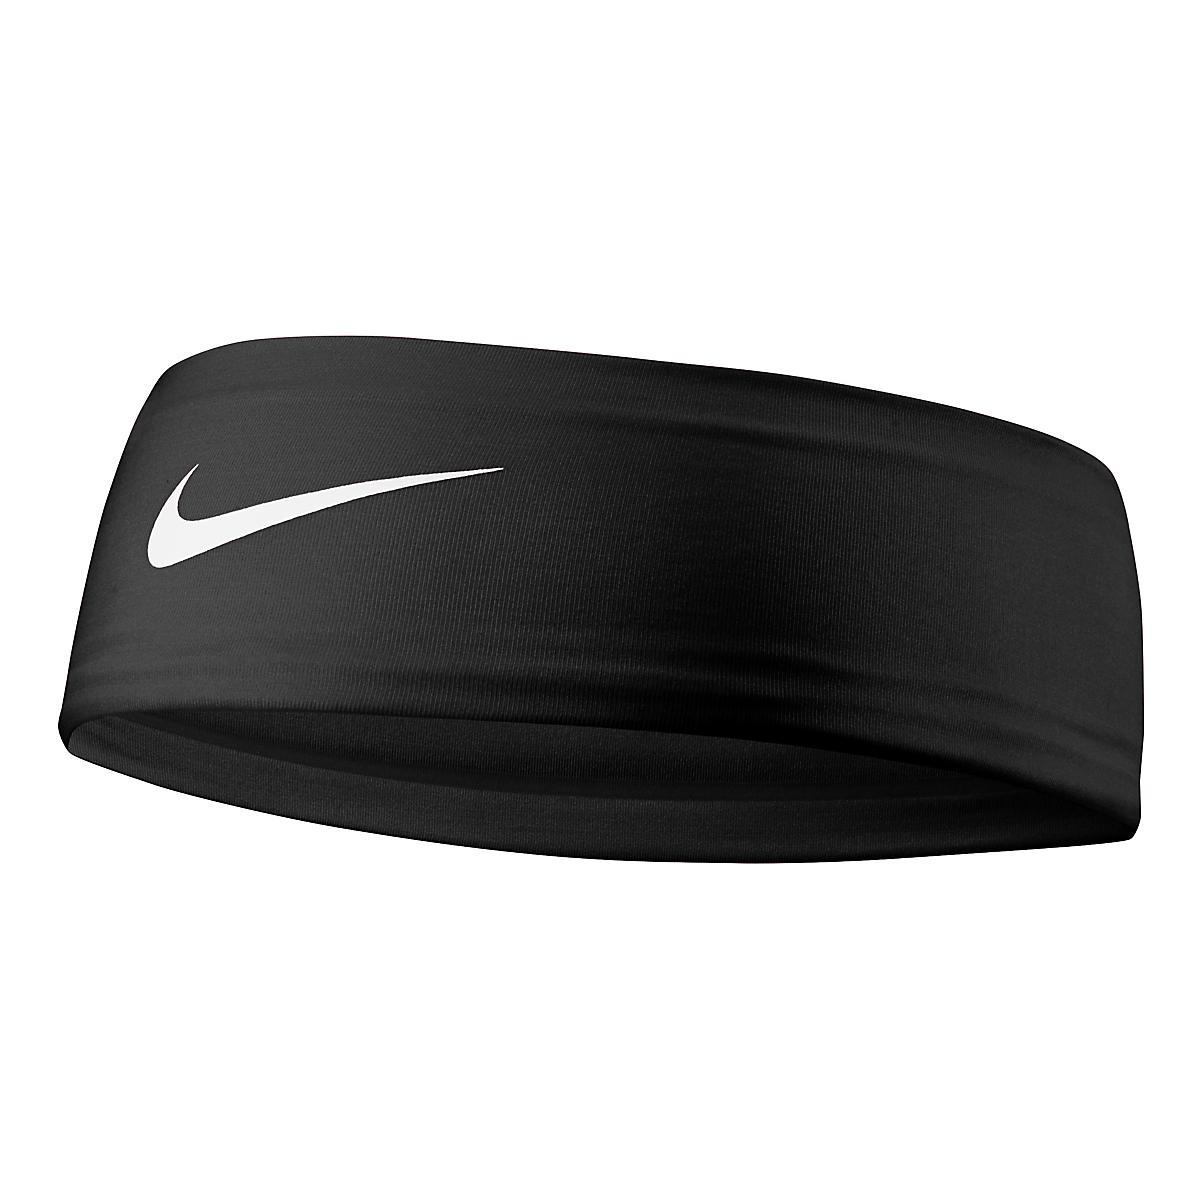 Nike Girls Fury Headband 2.0 Headwear f73d0652d46